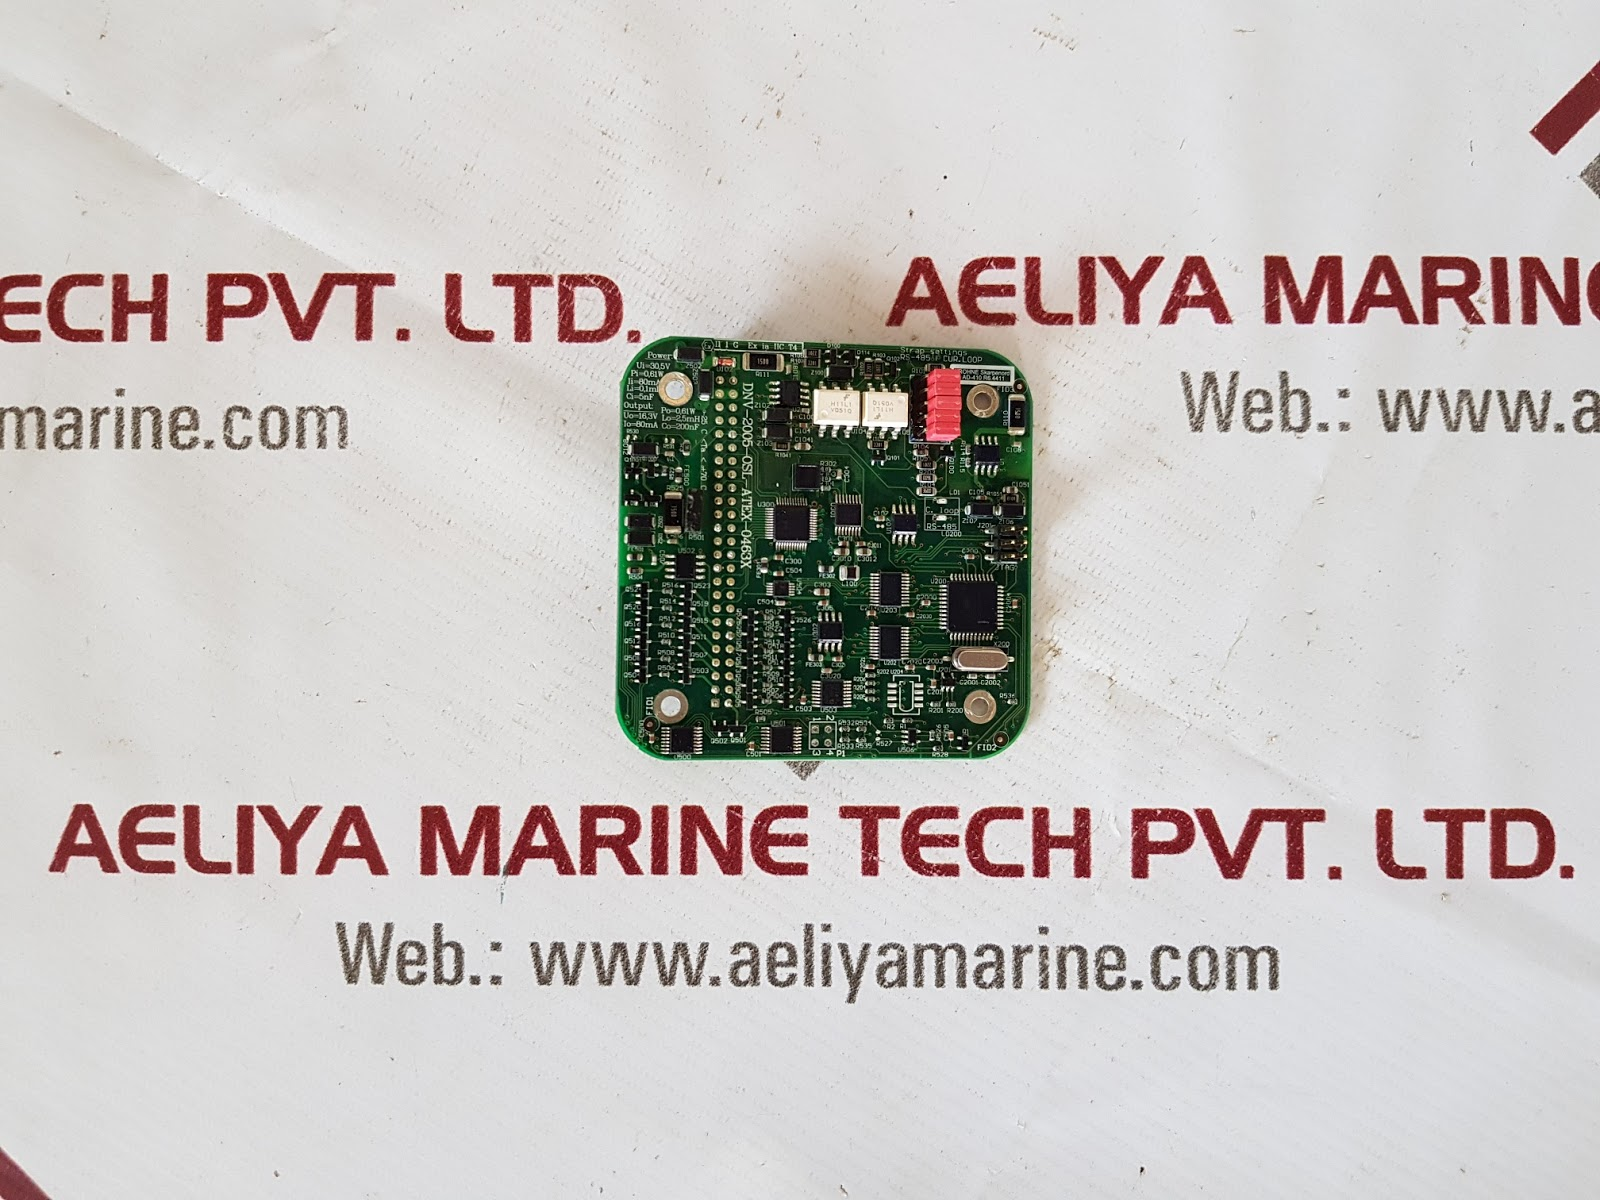 DNV-2005-OSL-ATEX-0463X AD410 REV 6 CARD | AELIYA MARINE